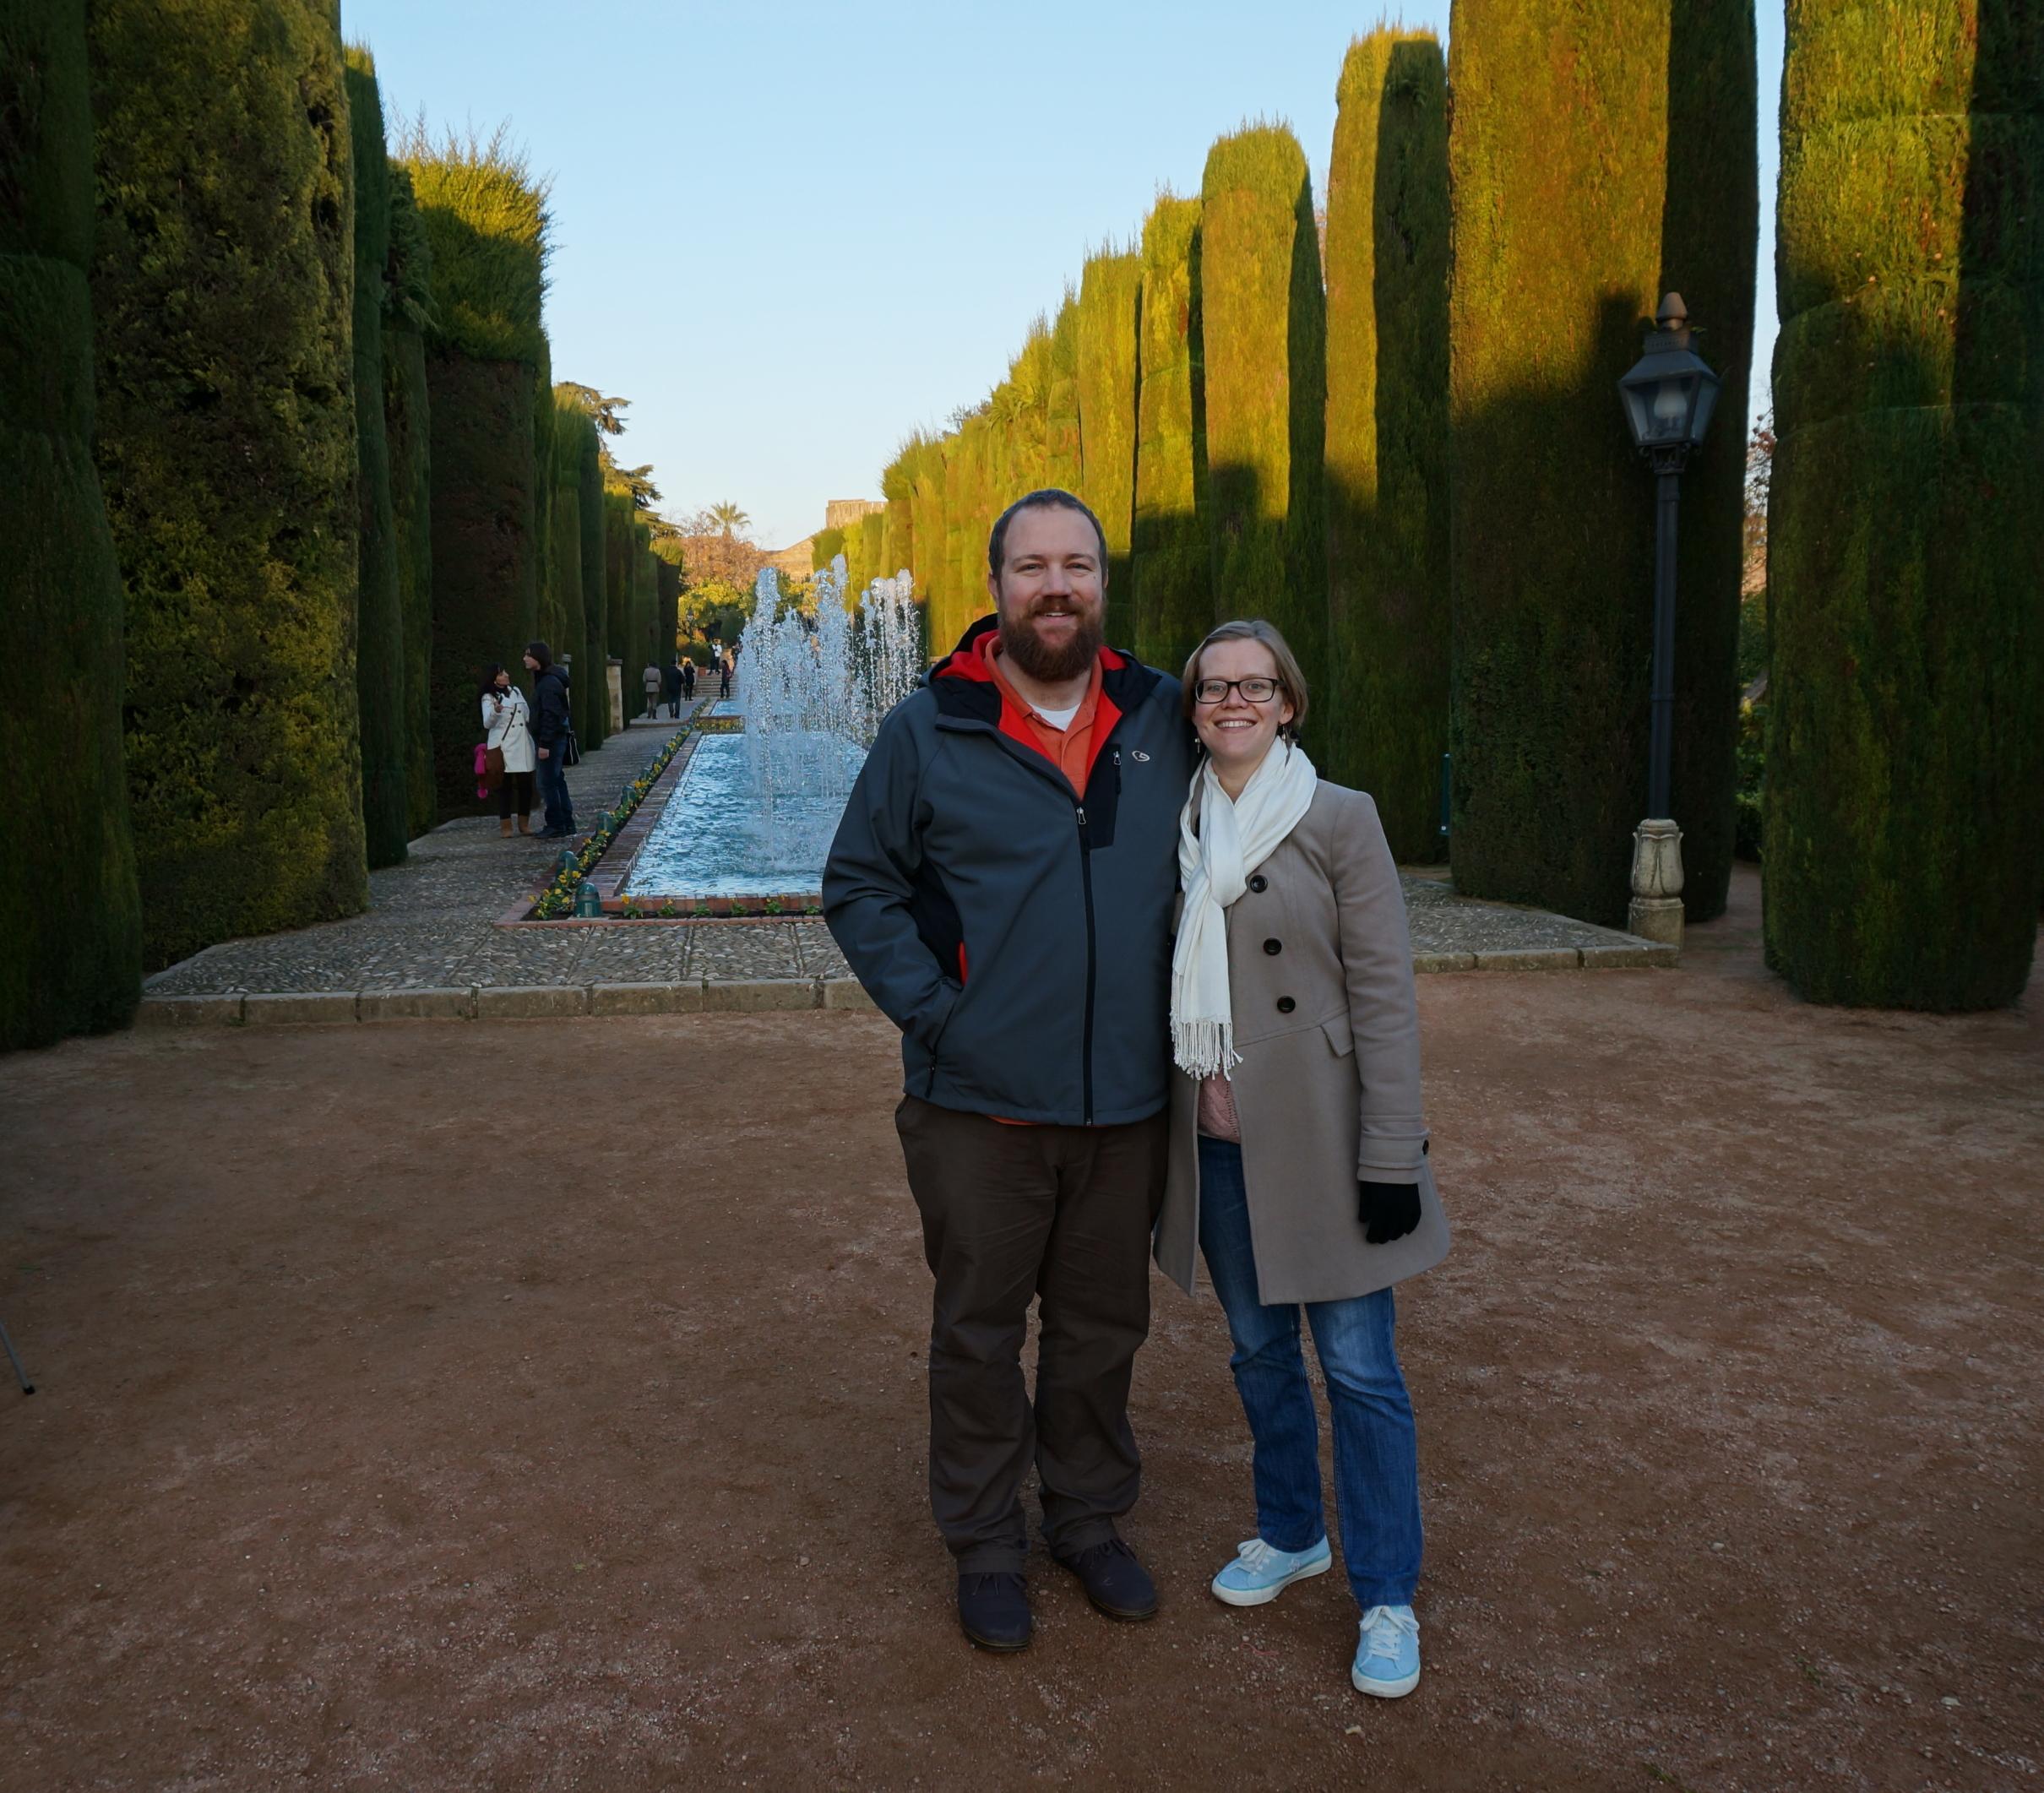 The Gardens of the Alcázar de los Reyes Cristianos